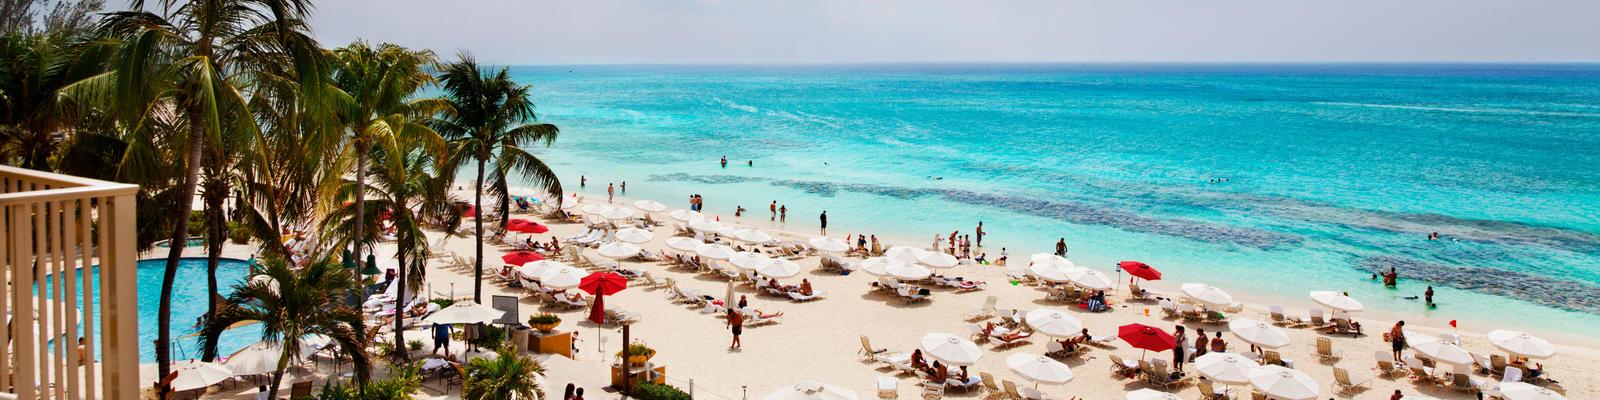 Grand Cayman (Photo:Jo Ann Snover/Shutterstock)